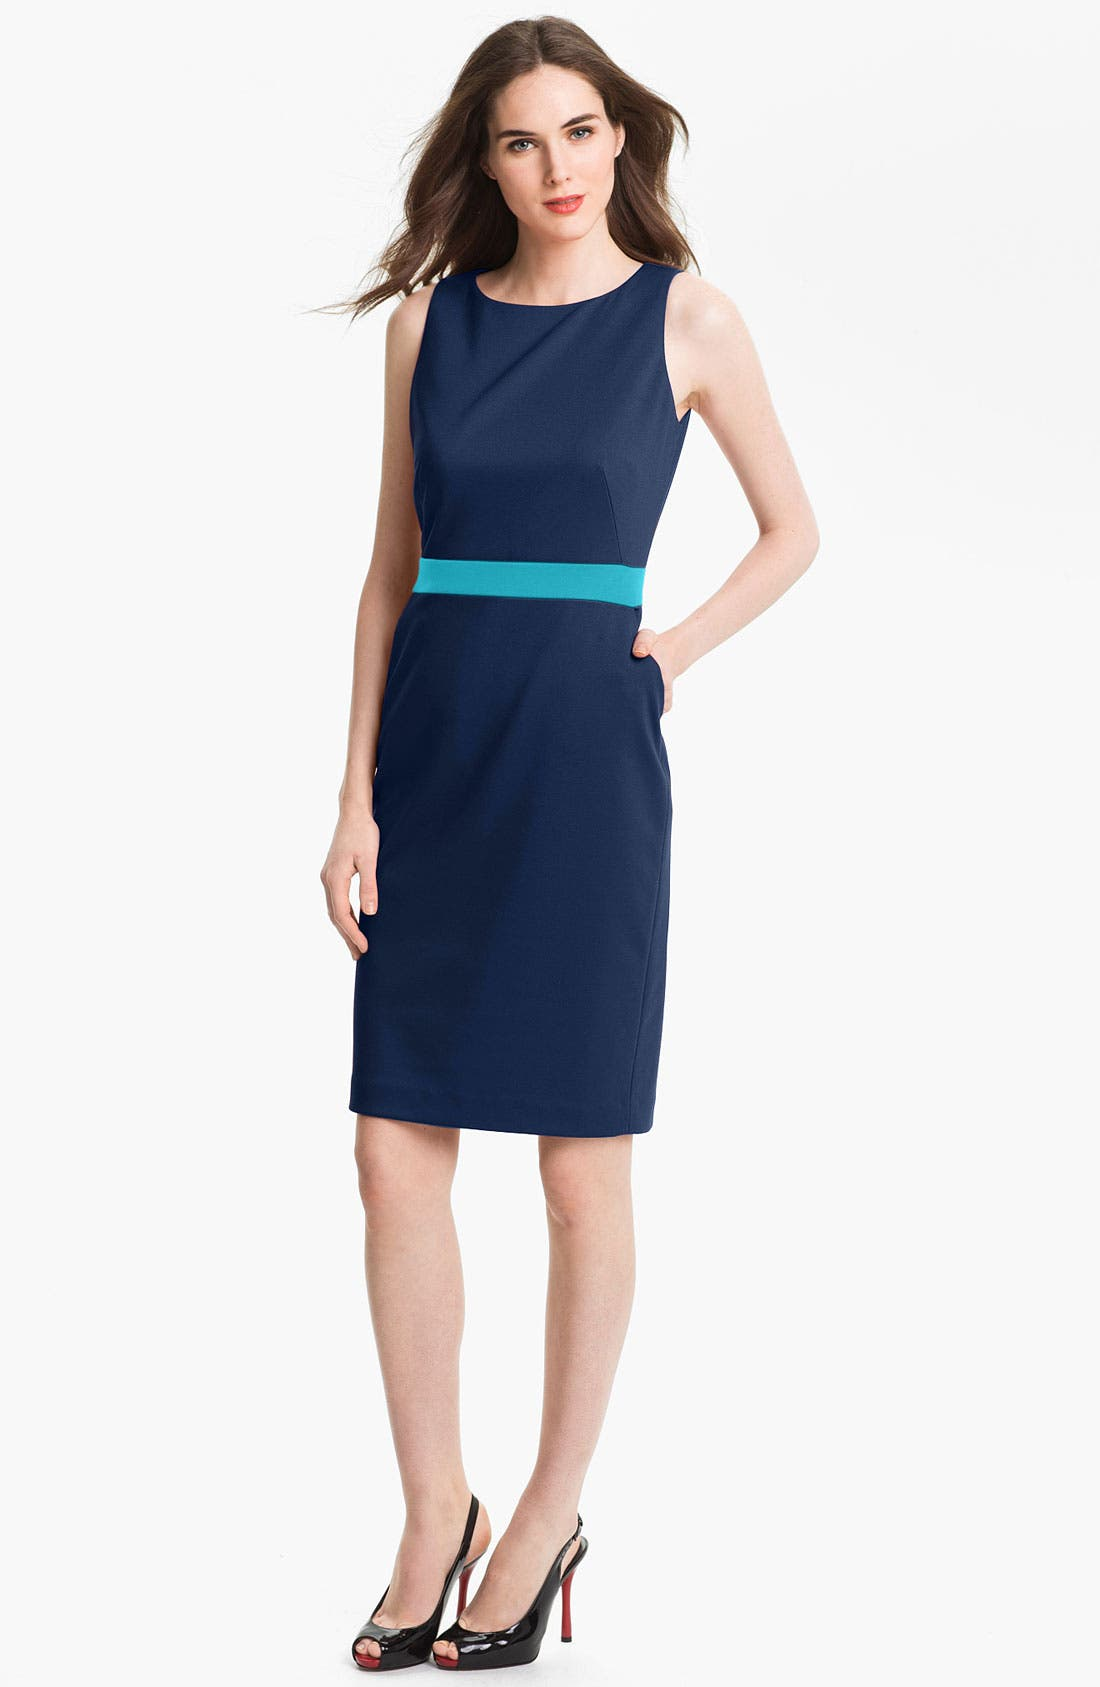 Alternate Image 1 Selected - Anne Klein Colorblock Shift Dress